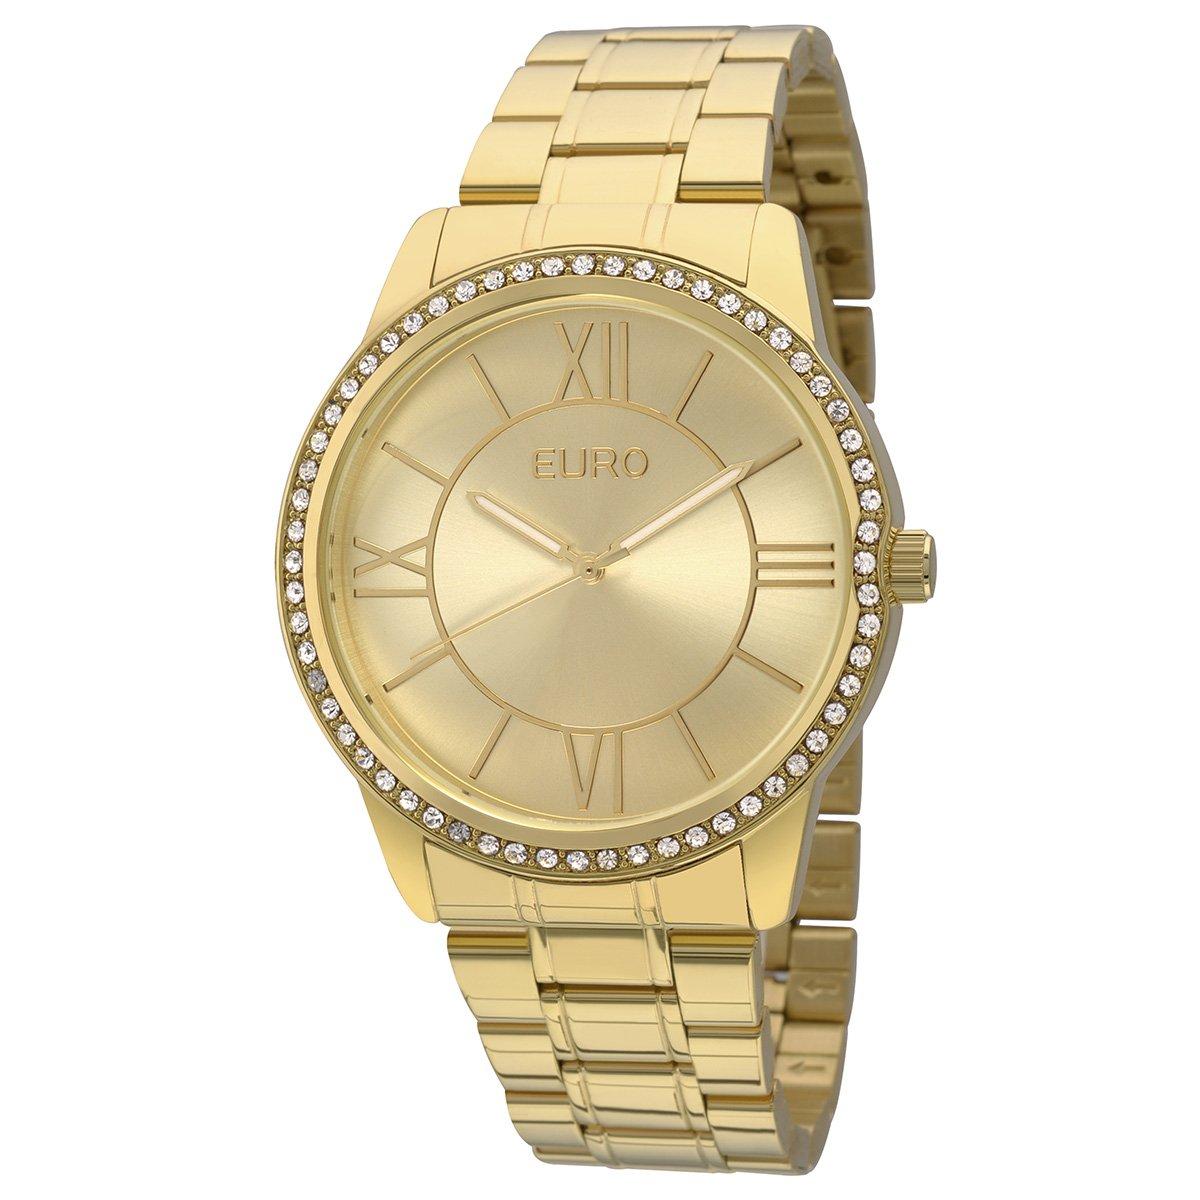 Relógio Euro Feminino EU2035YEA-4D - Dourado - Compre Agora   Zattini fcb70ca208